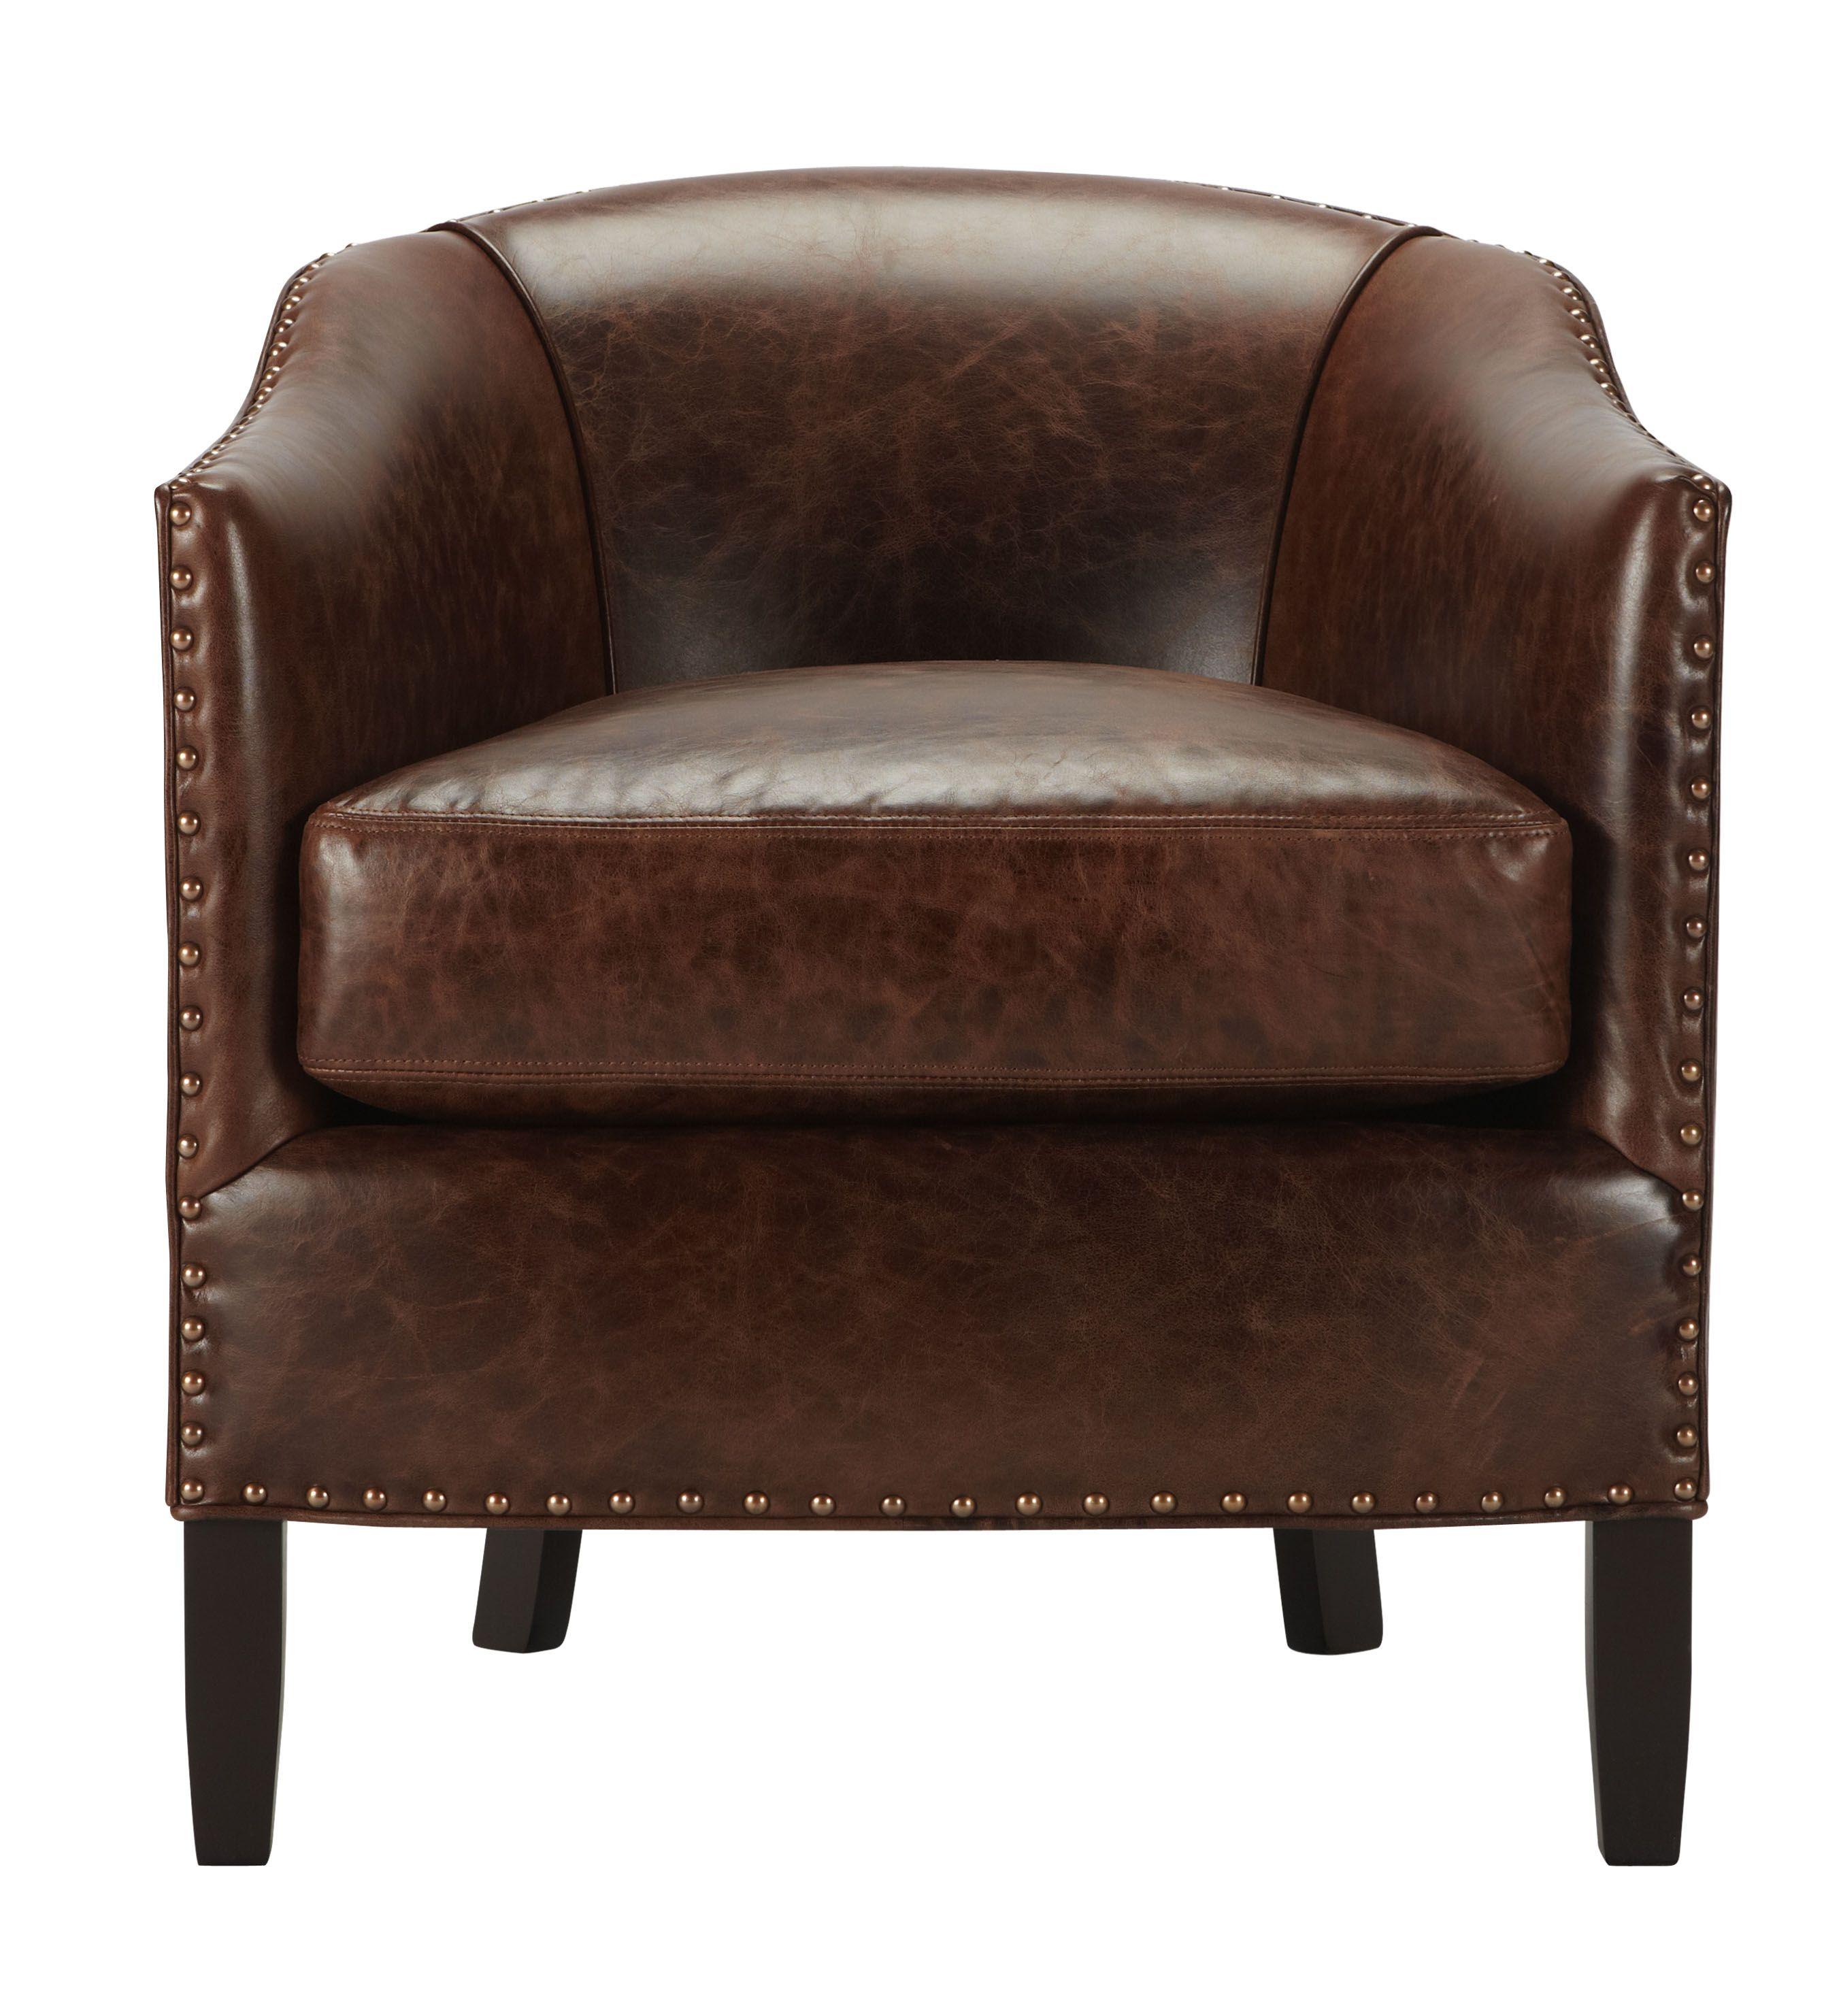 Arhaus Leather Sofa Grey Velvet Uk Anything Chocolate Like Our Giles Chair